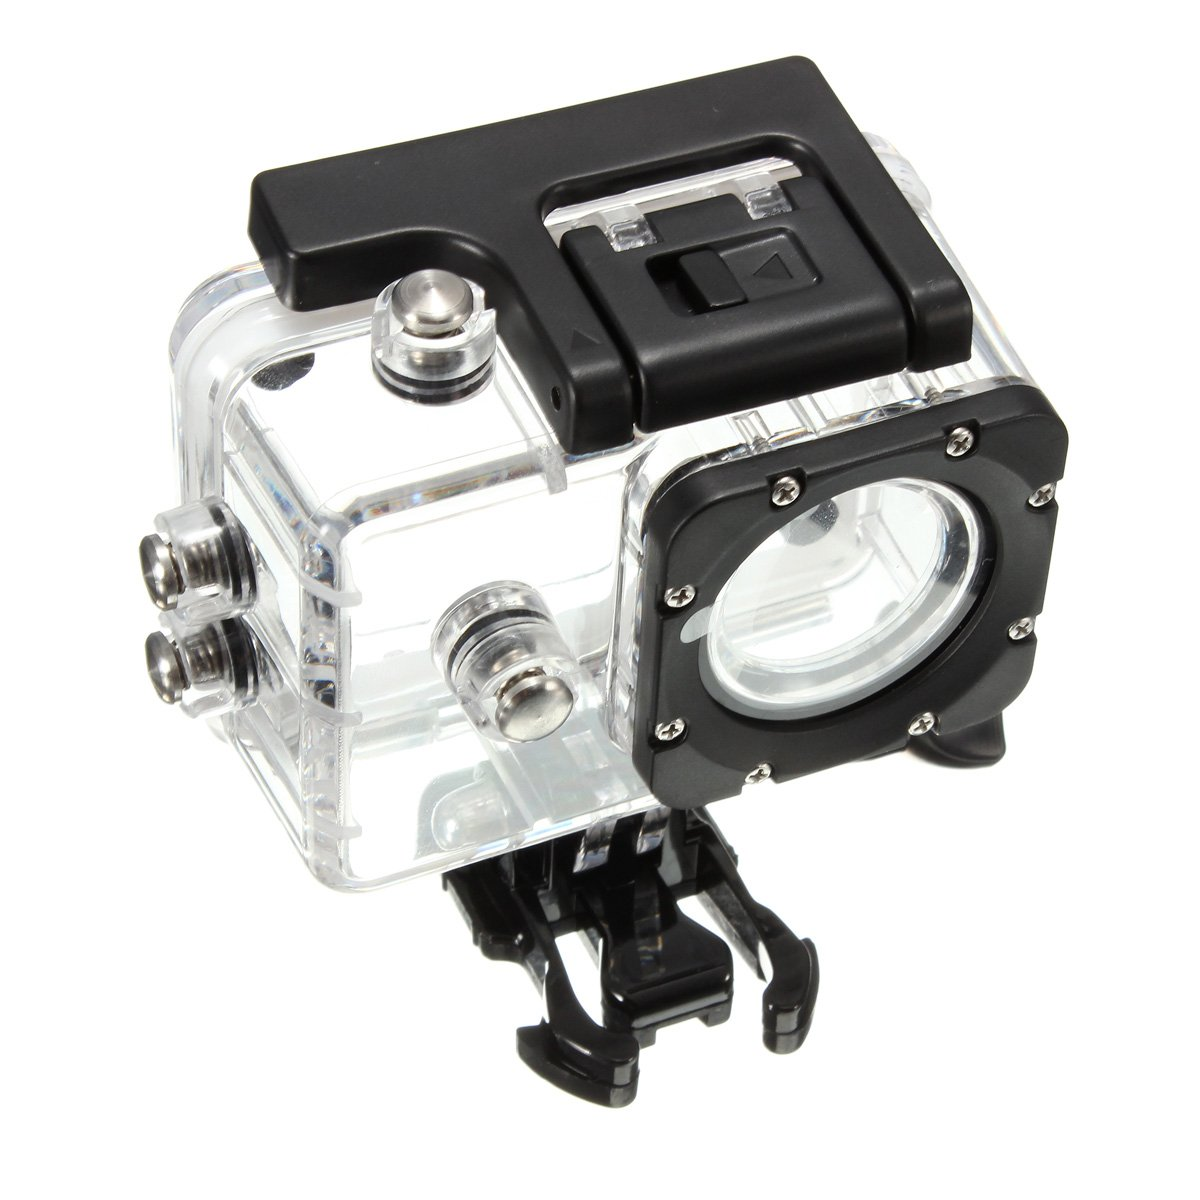 Resistente al agua completa Familymall Dive impermeable para SJ4000 videocámaras Familymall Co. LTD vb3ZFHcmY